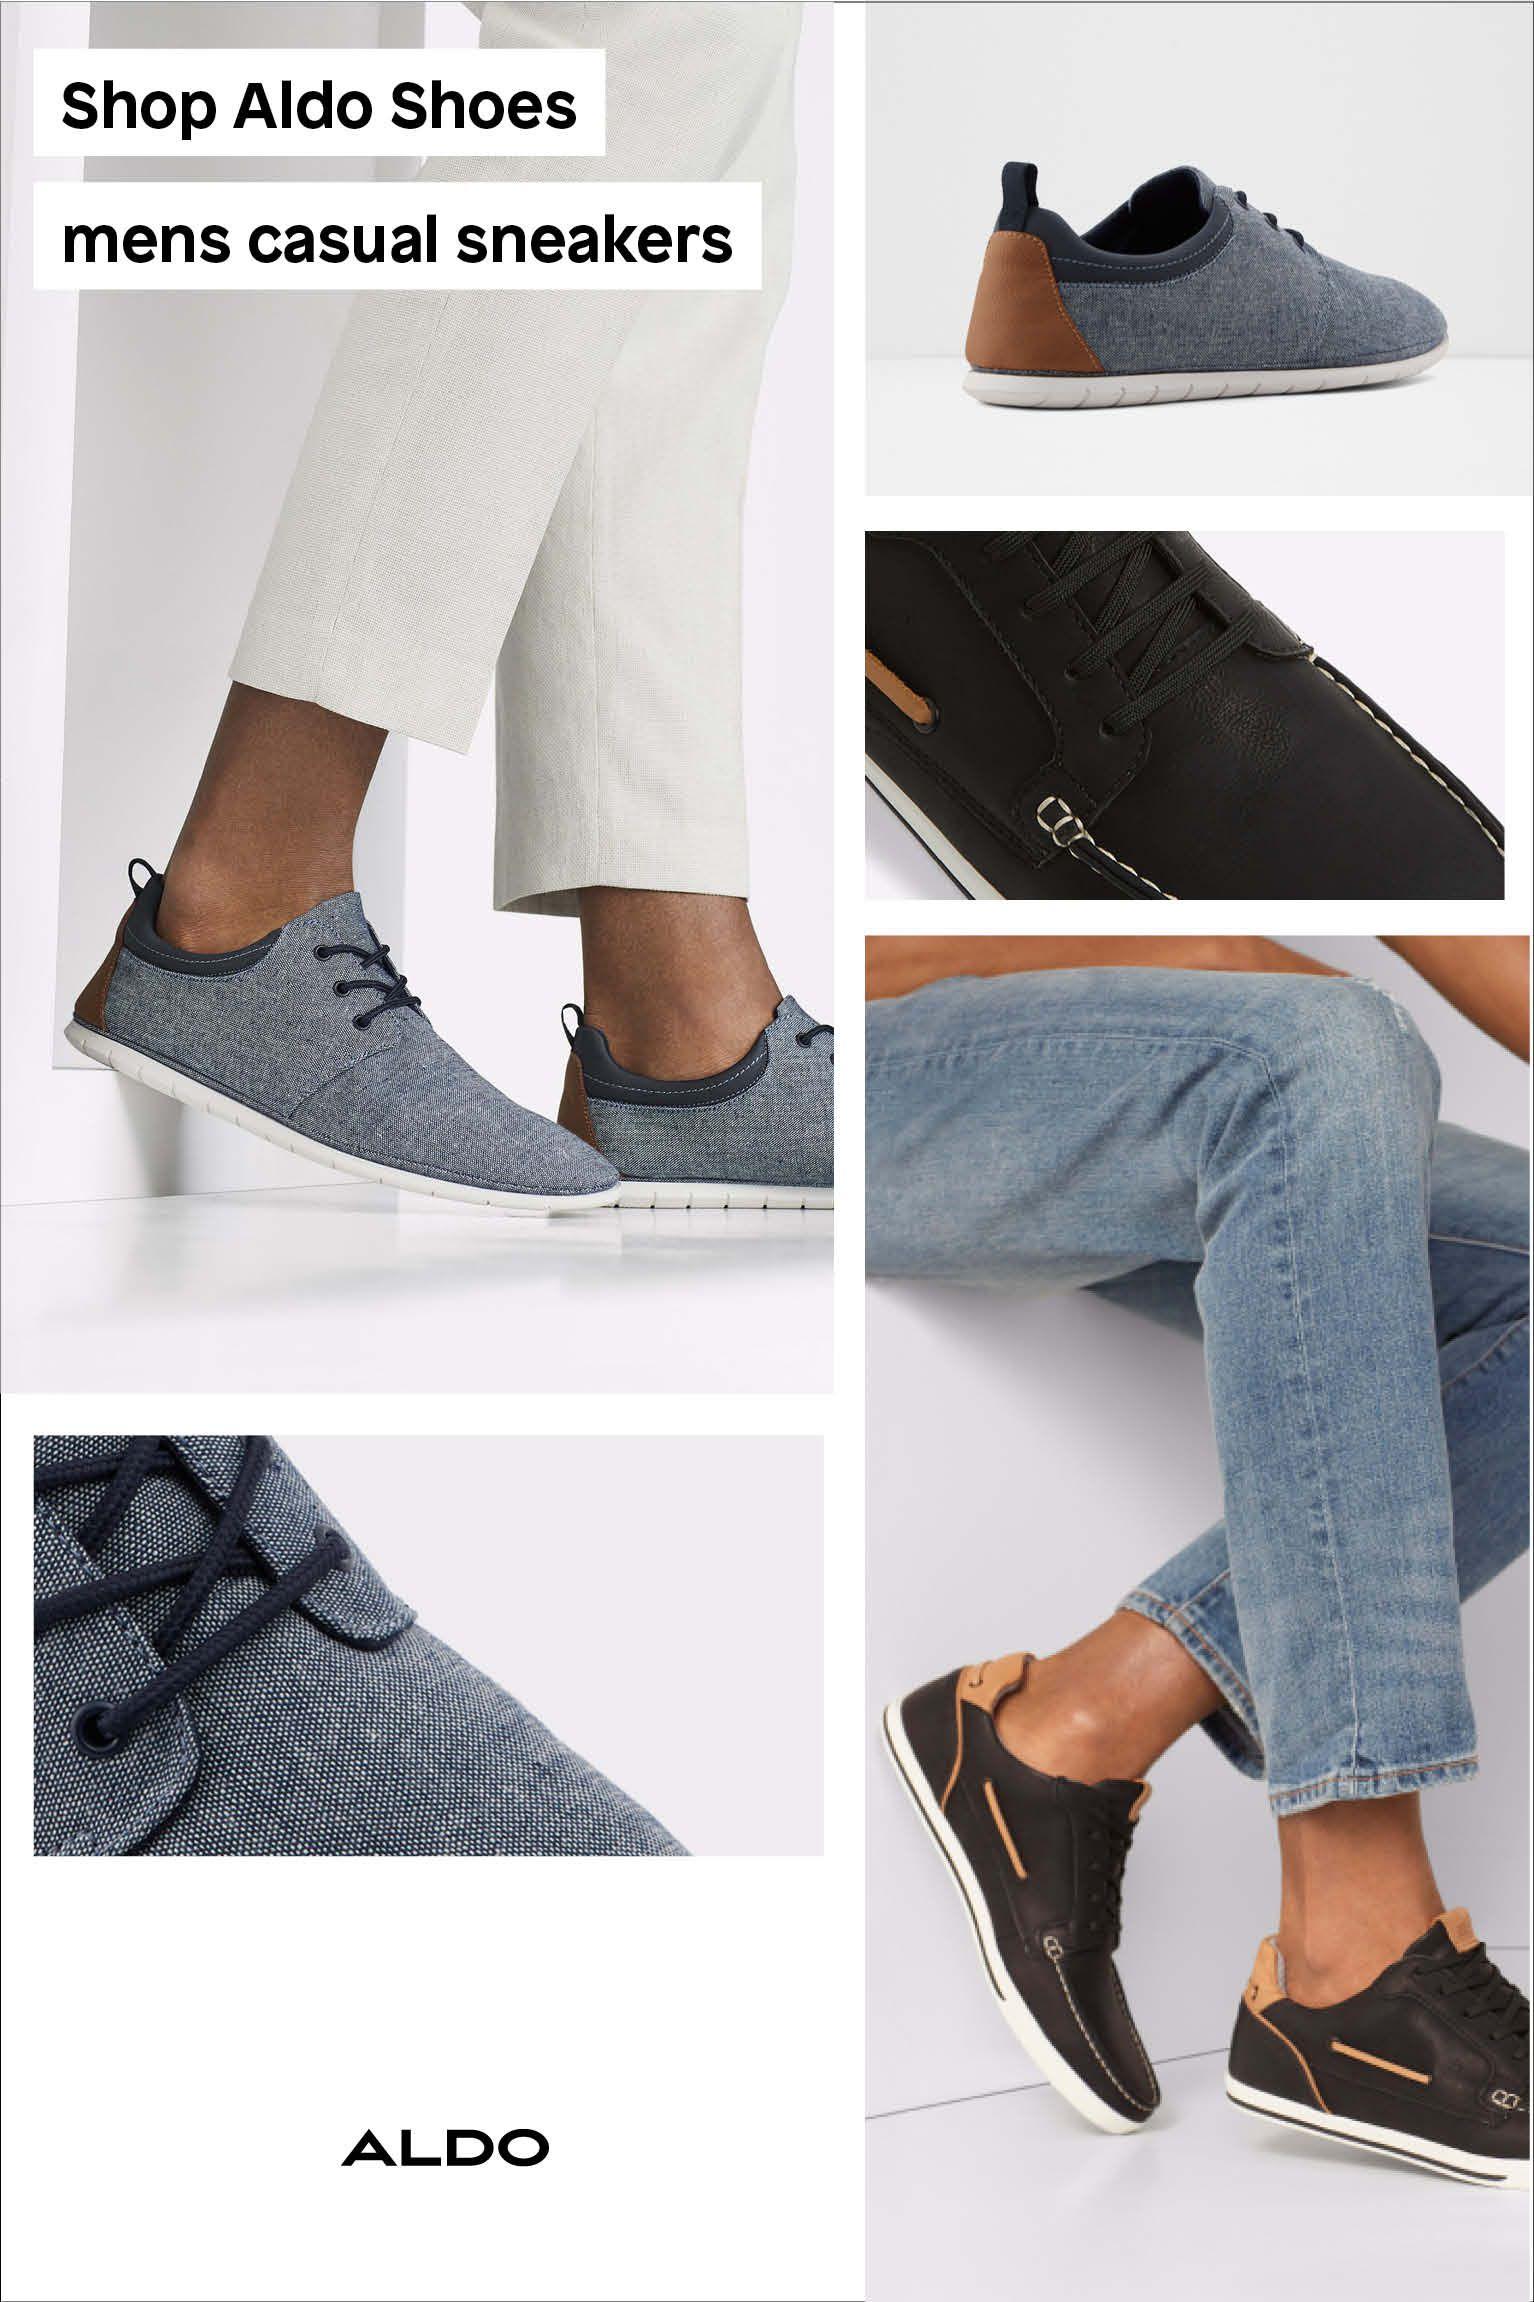 Aldo shoes casual mens sneakers | Boat